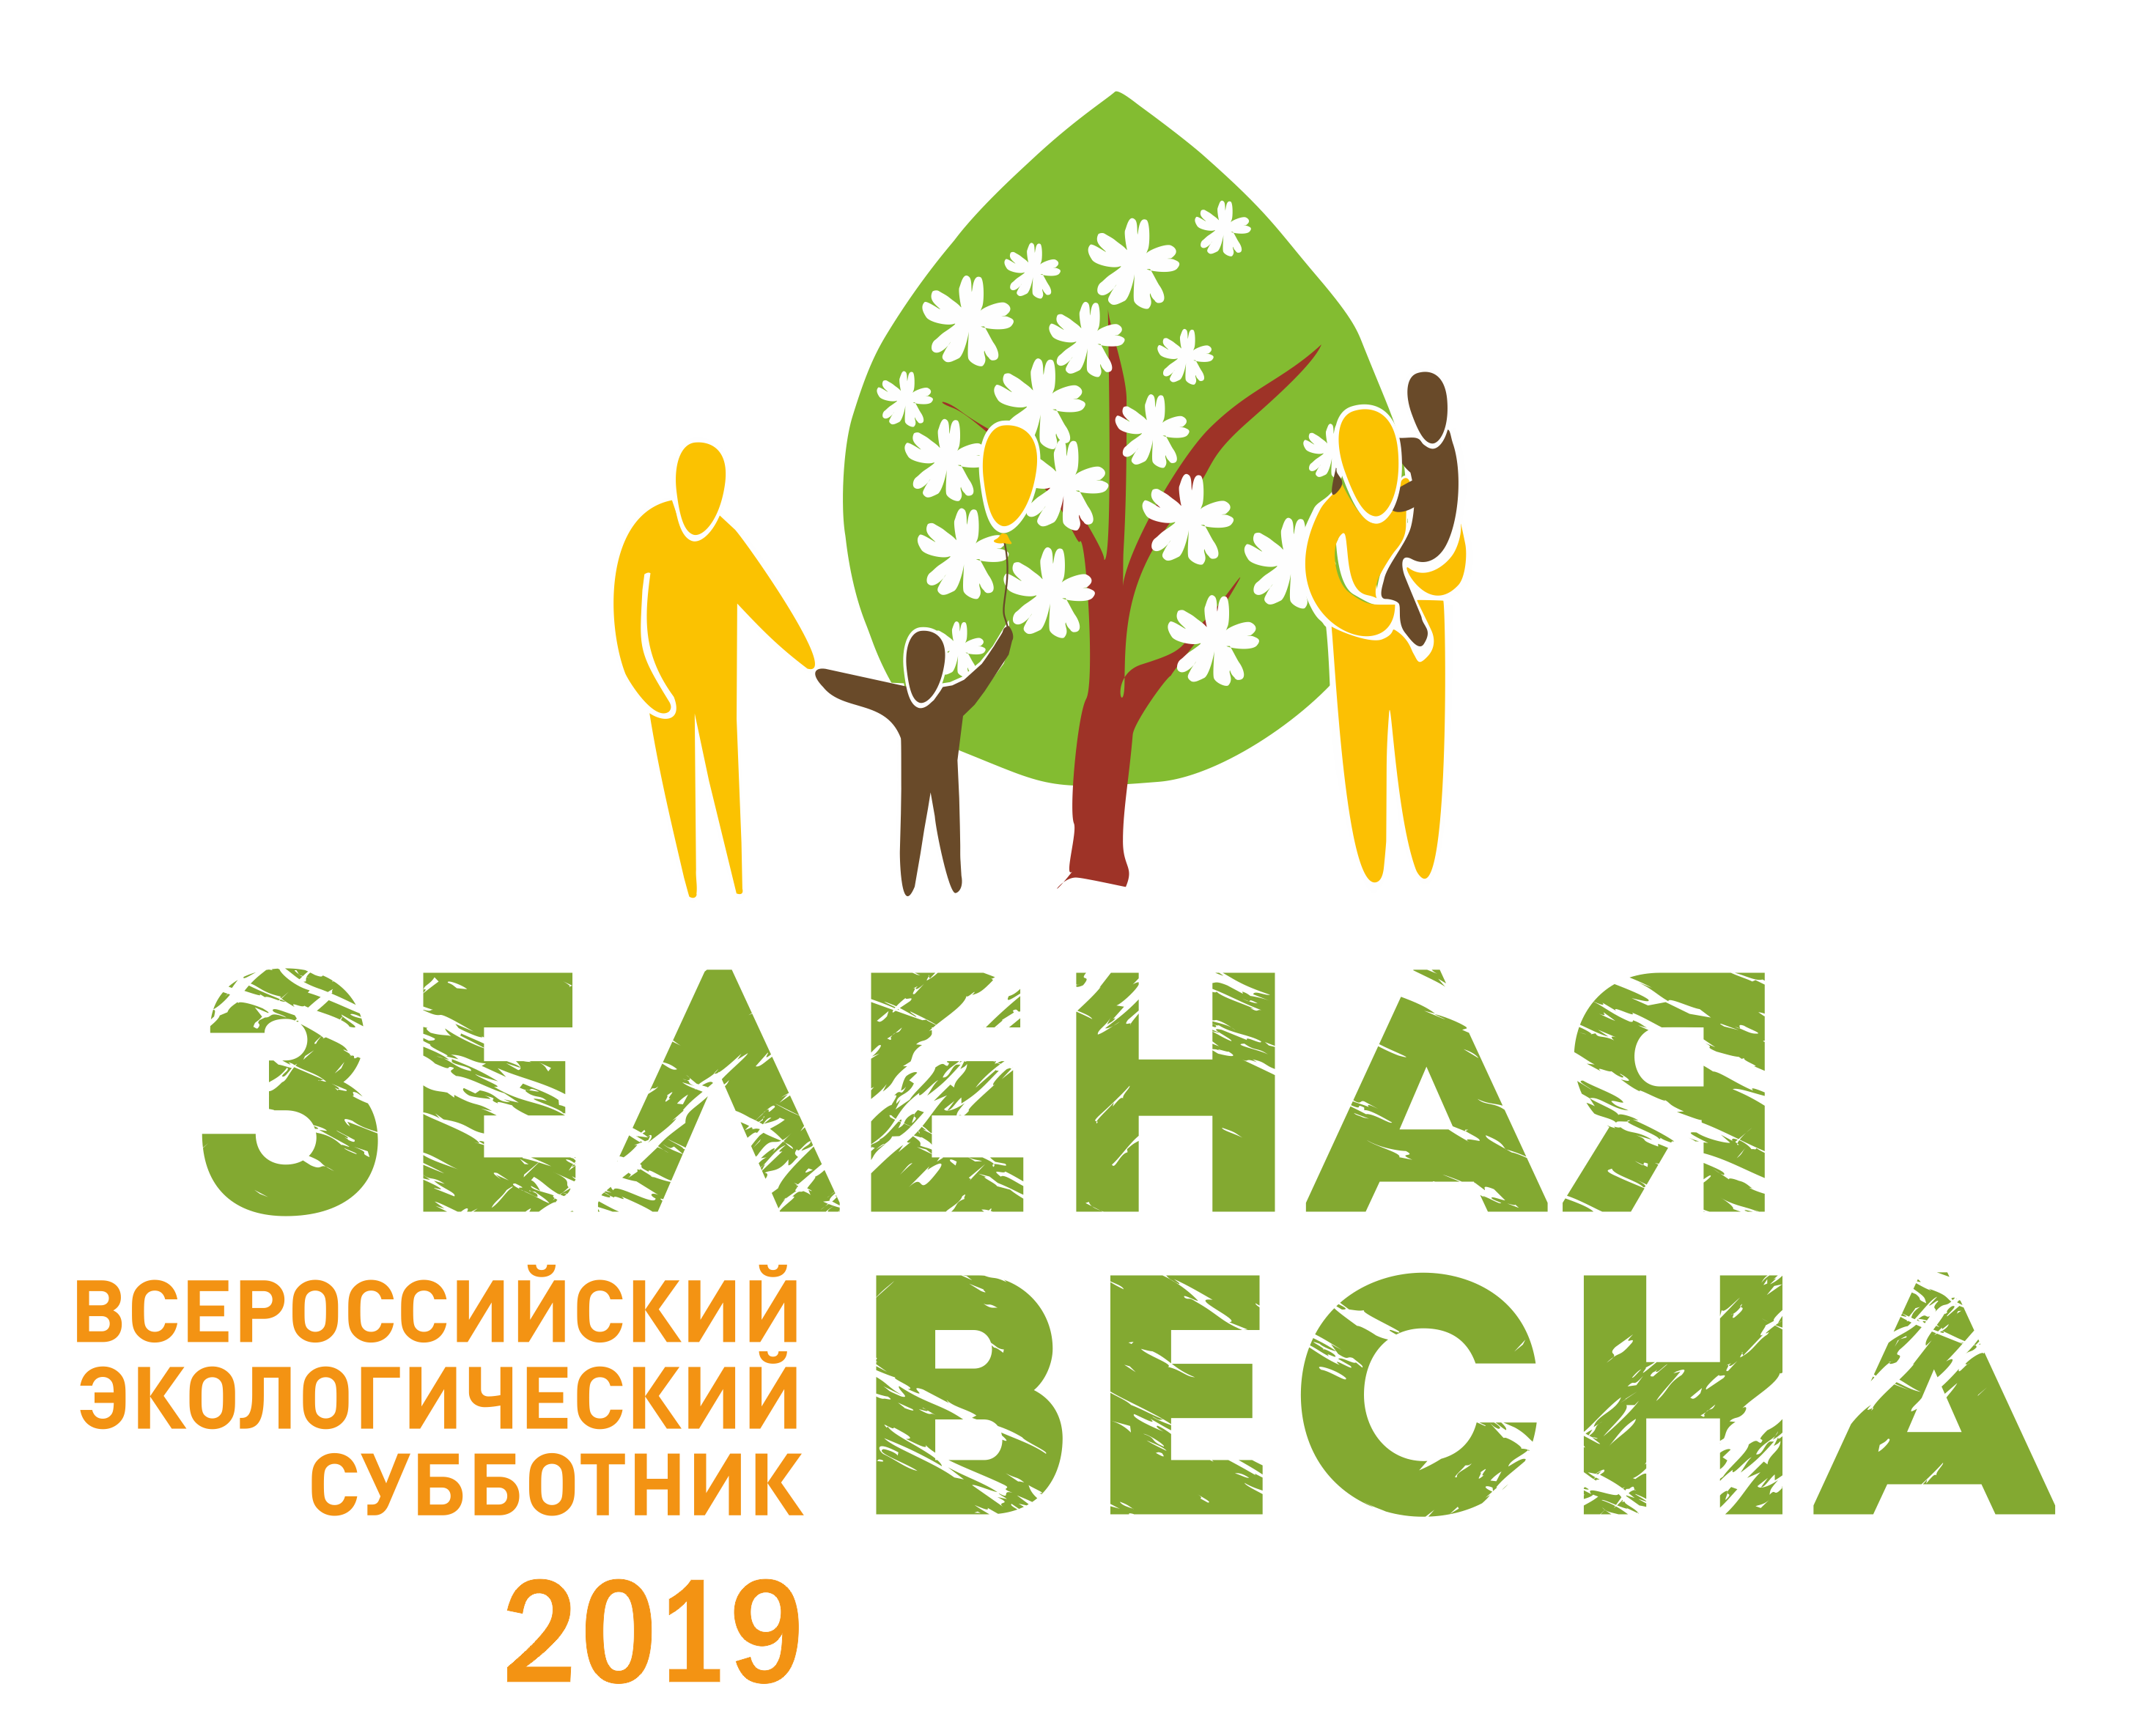 Zelenaya_Vesna-2019